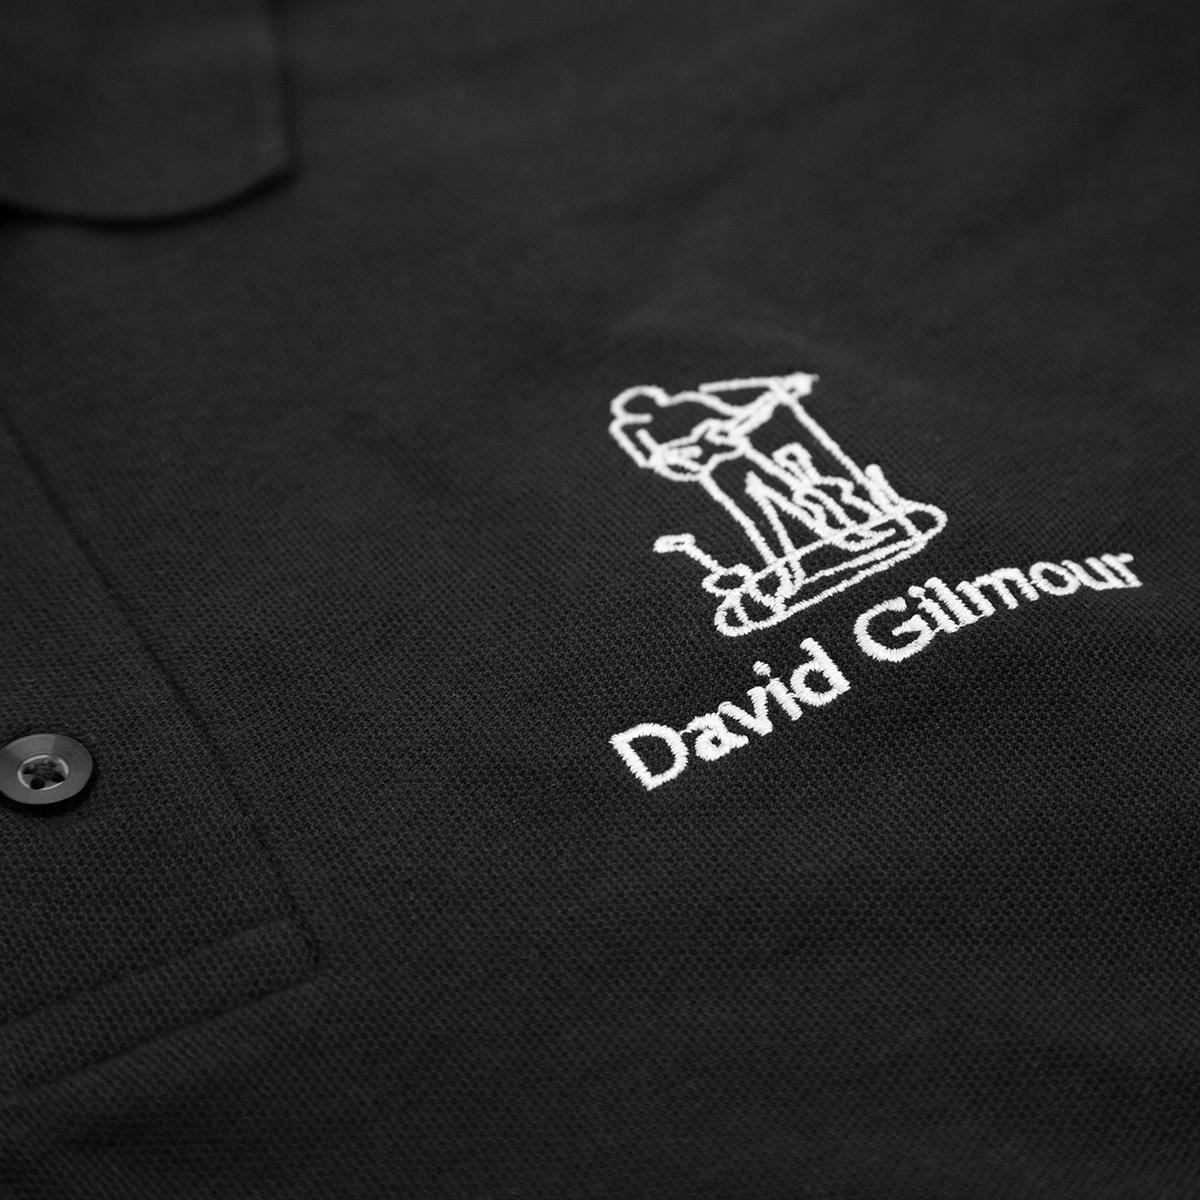 David Gilmour Guitar Embroidered Polo